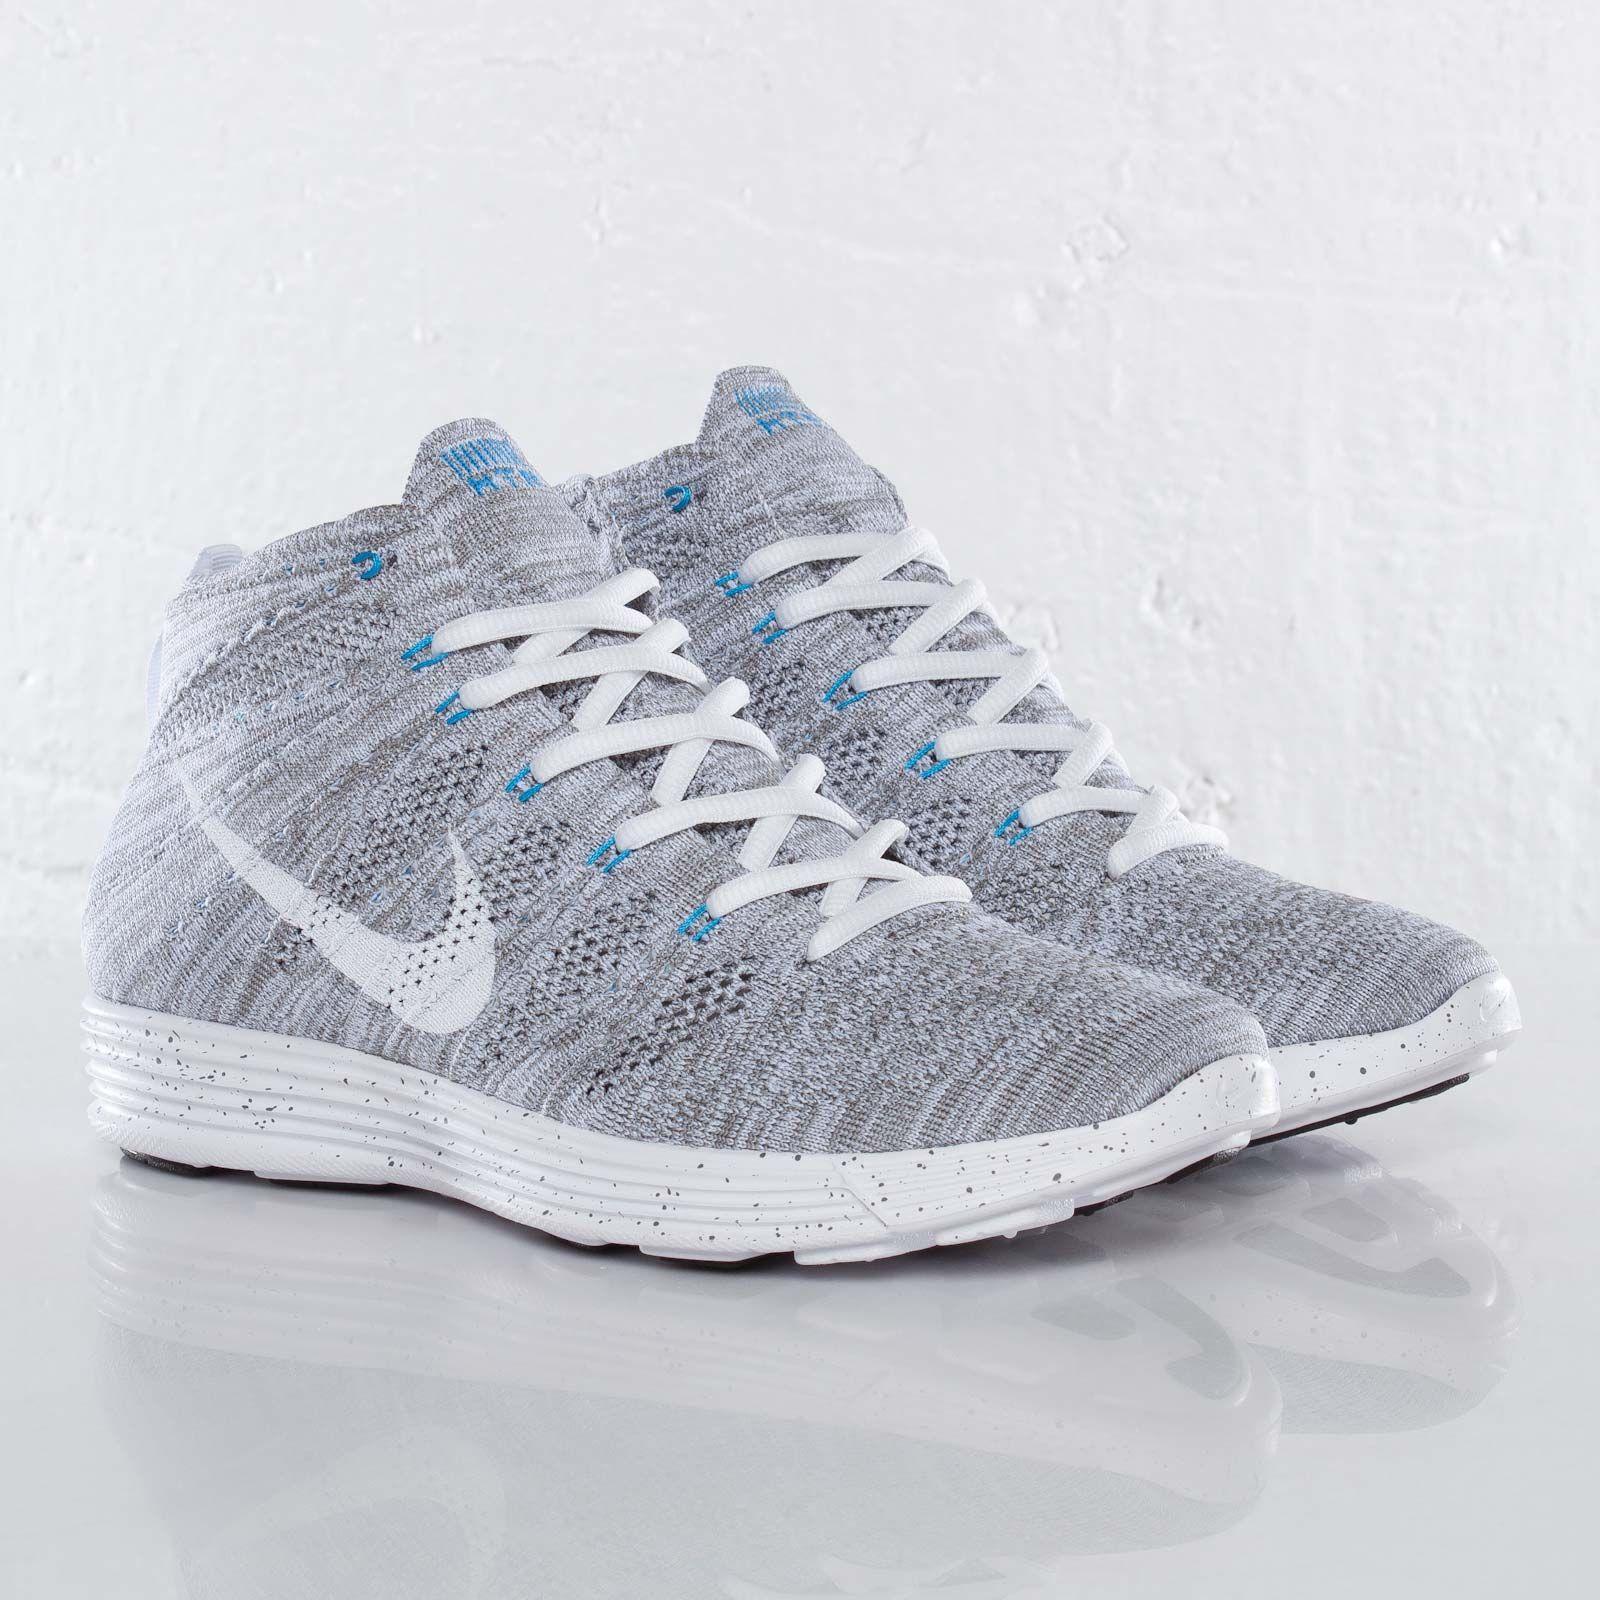 UK Online Nike Flyknit Lunar2 Womens Running Shoe  Light CharcoalHyper PunchBlack L70i2087 online wi